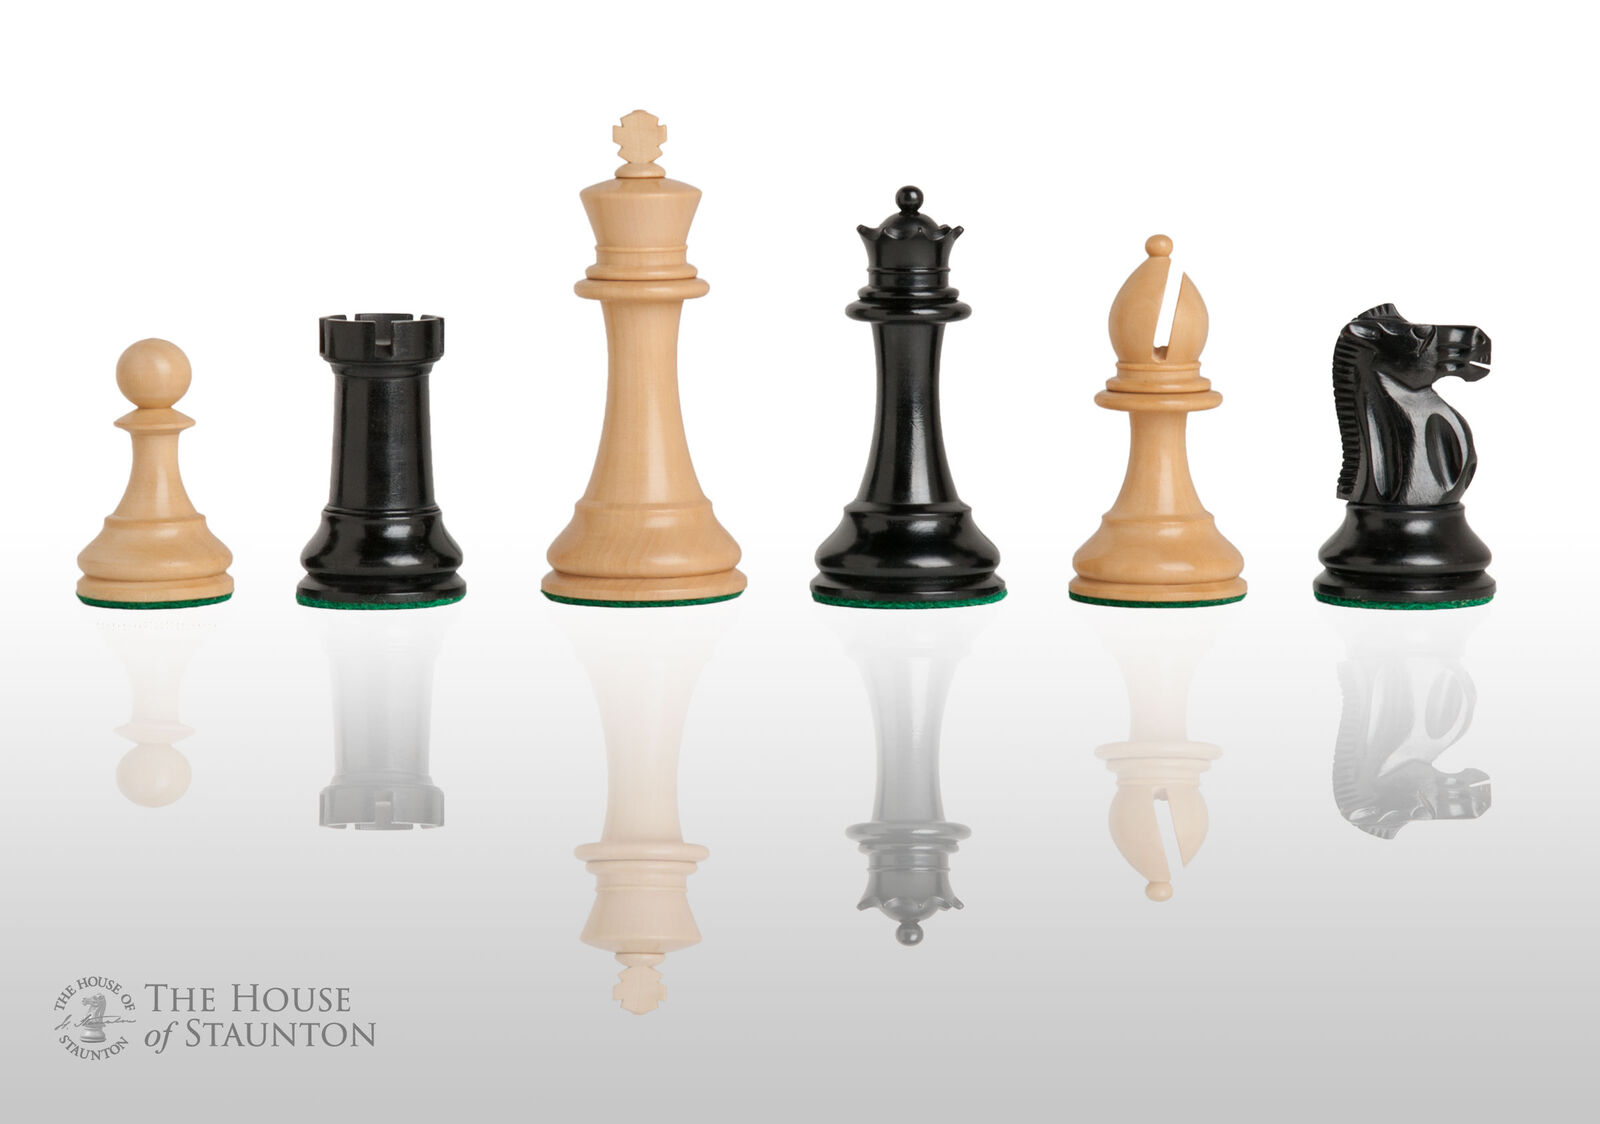 USCF Sales The British Chess Company Staunton Popular Chess Set